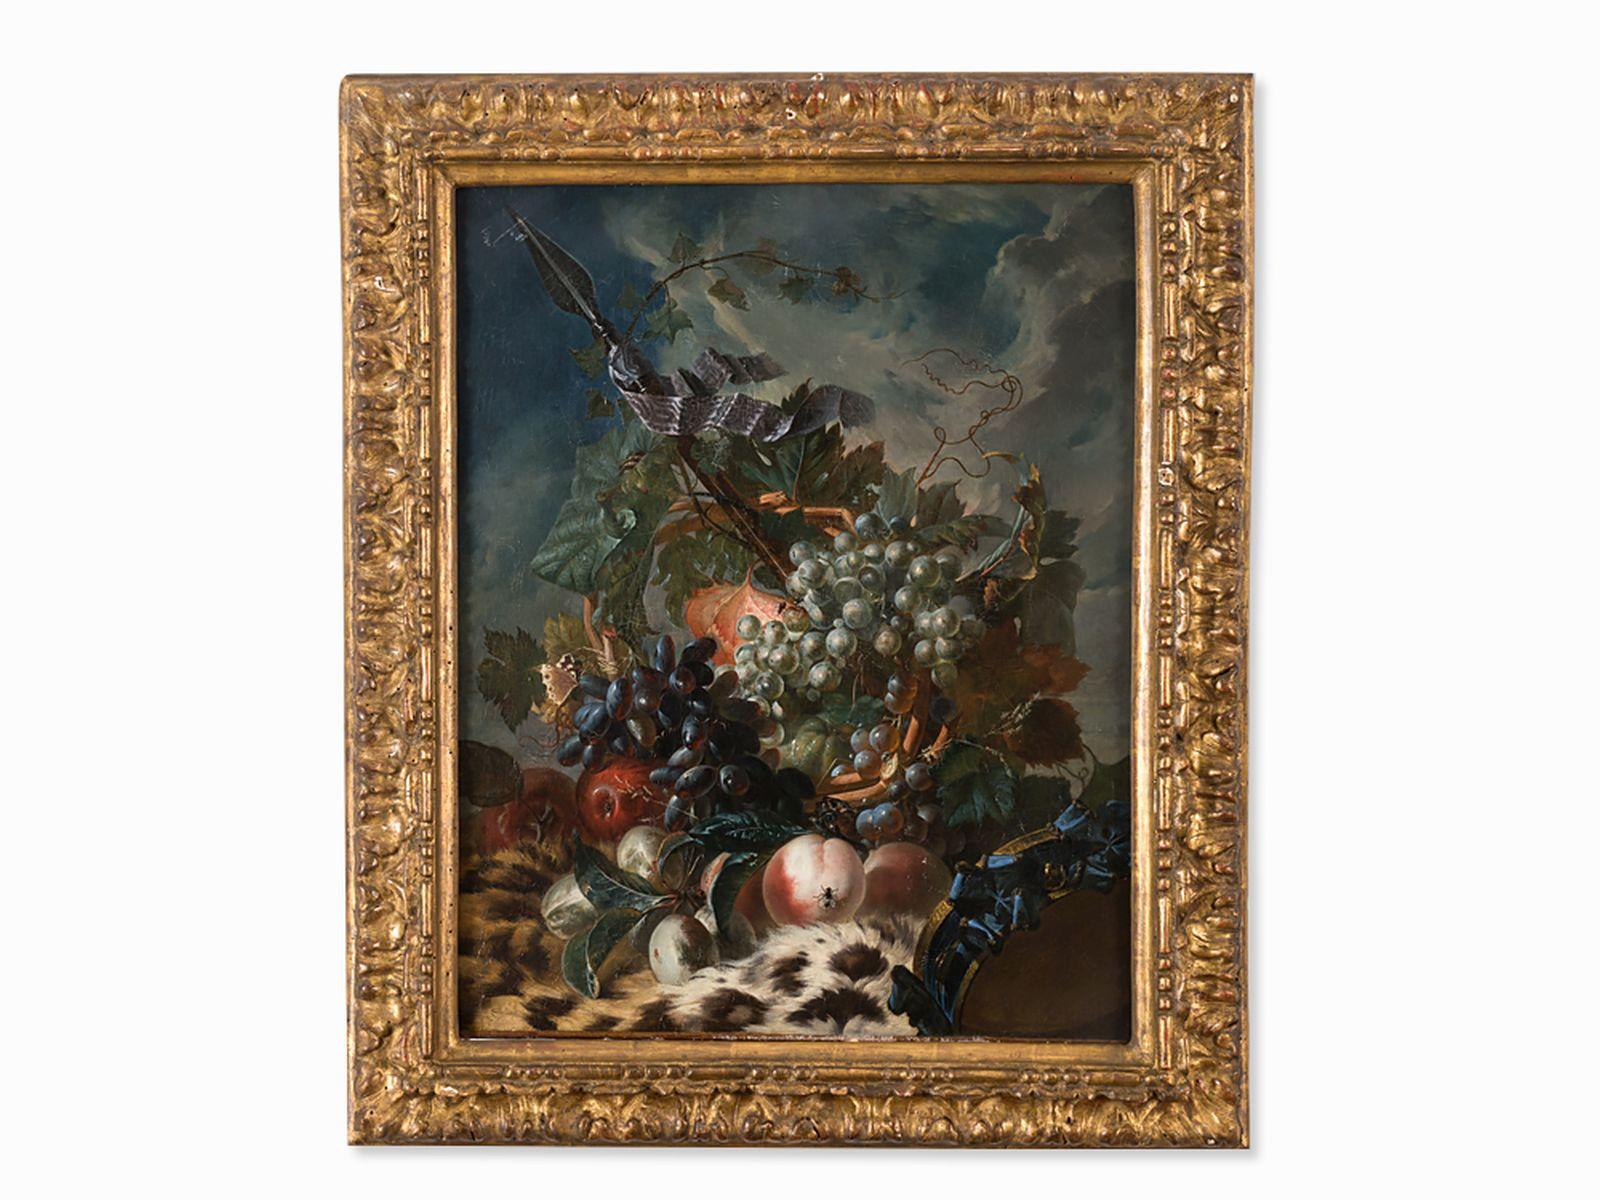 "#39 Miguel Parra (1780/84-1846), Still Life with Fruit & Lance, Oil | Miguel Parra (1780/84-1846), ""Früchtestillleben mit Lanze"", Öl Image"